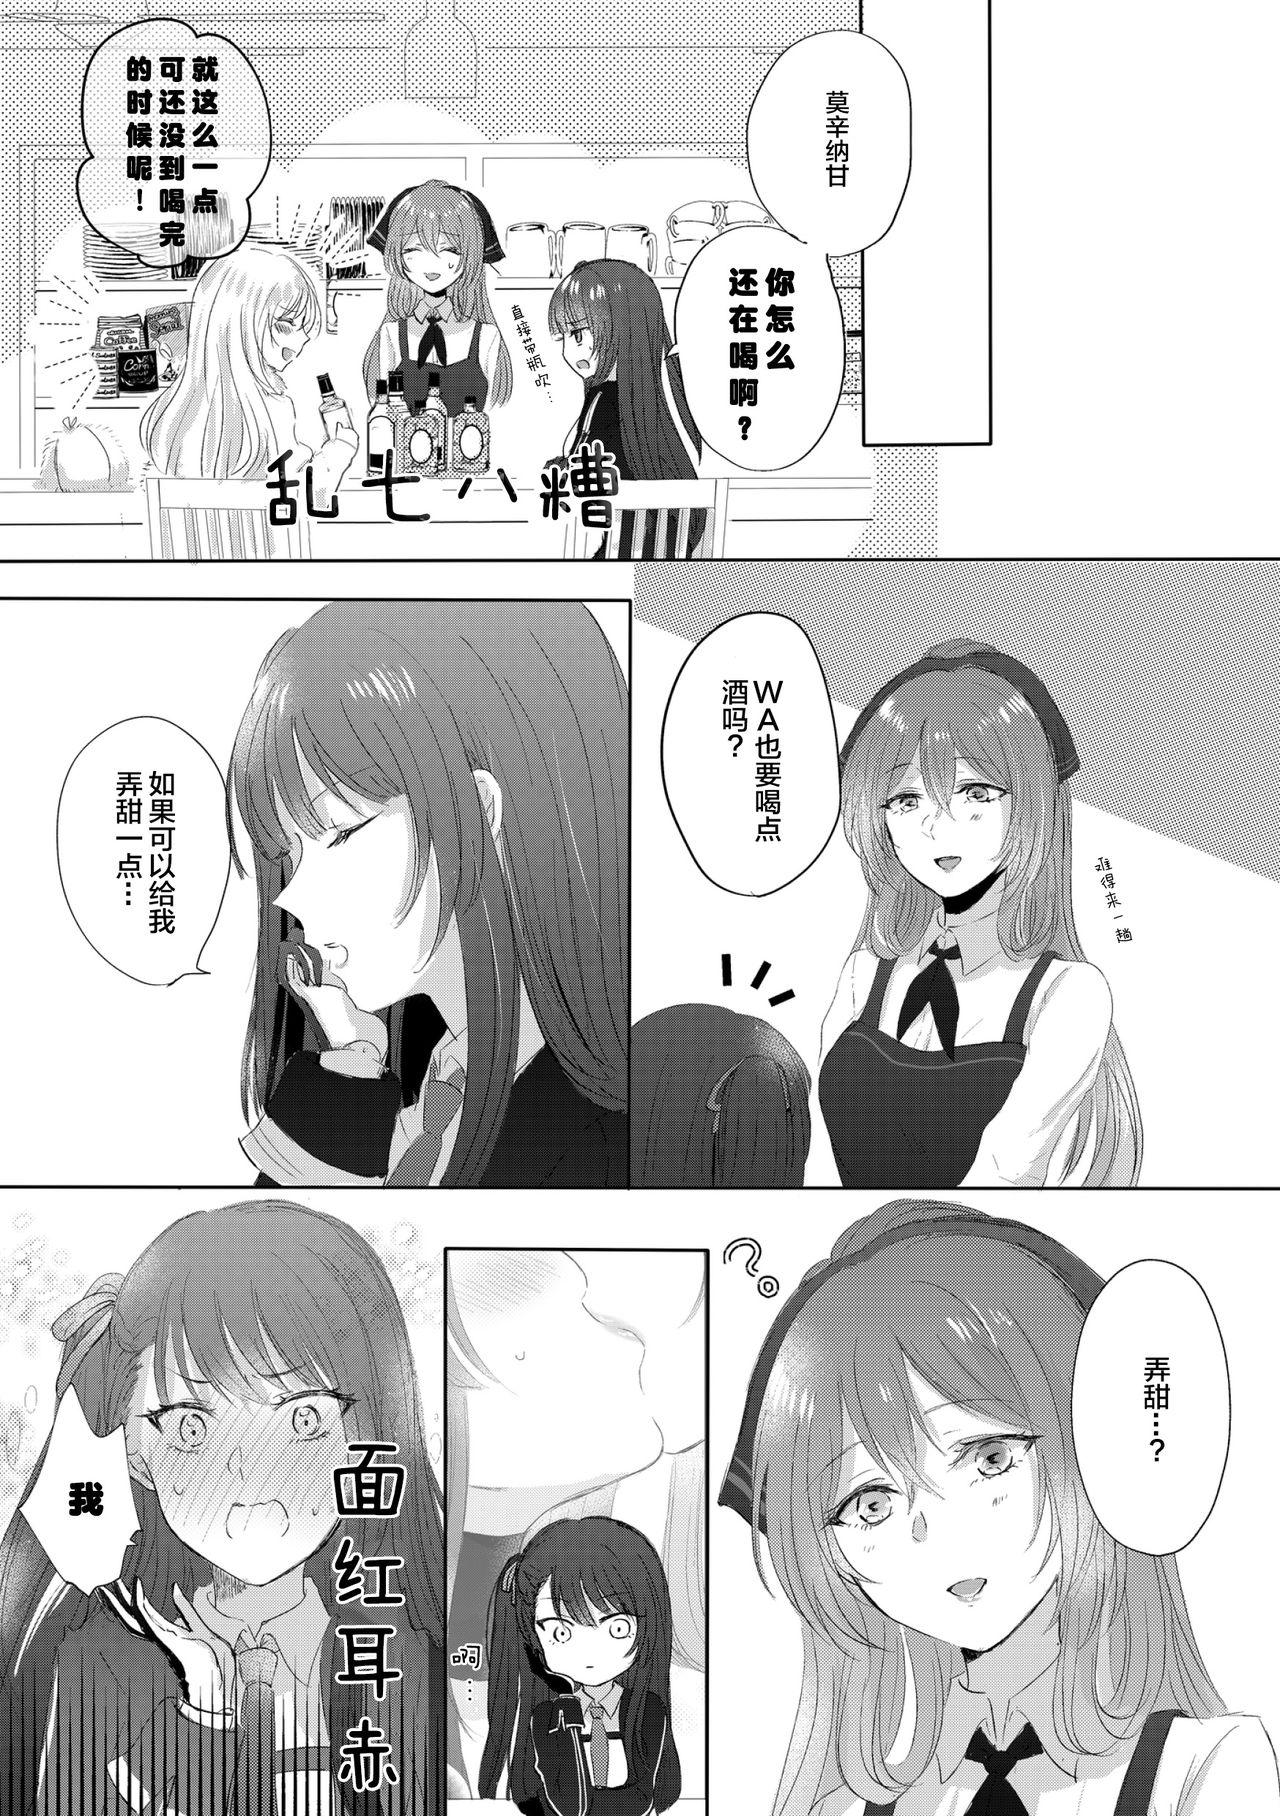 [(Yuri=18L)sui] Alcohol wa Amai (Girls' Frontline) [Chinese]   酒精是甘甜滋味 (少女前線) [提黄灯喵汉化组] 21